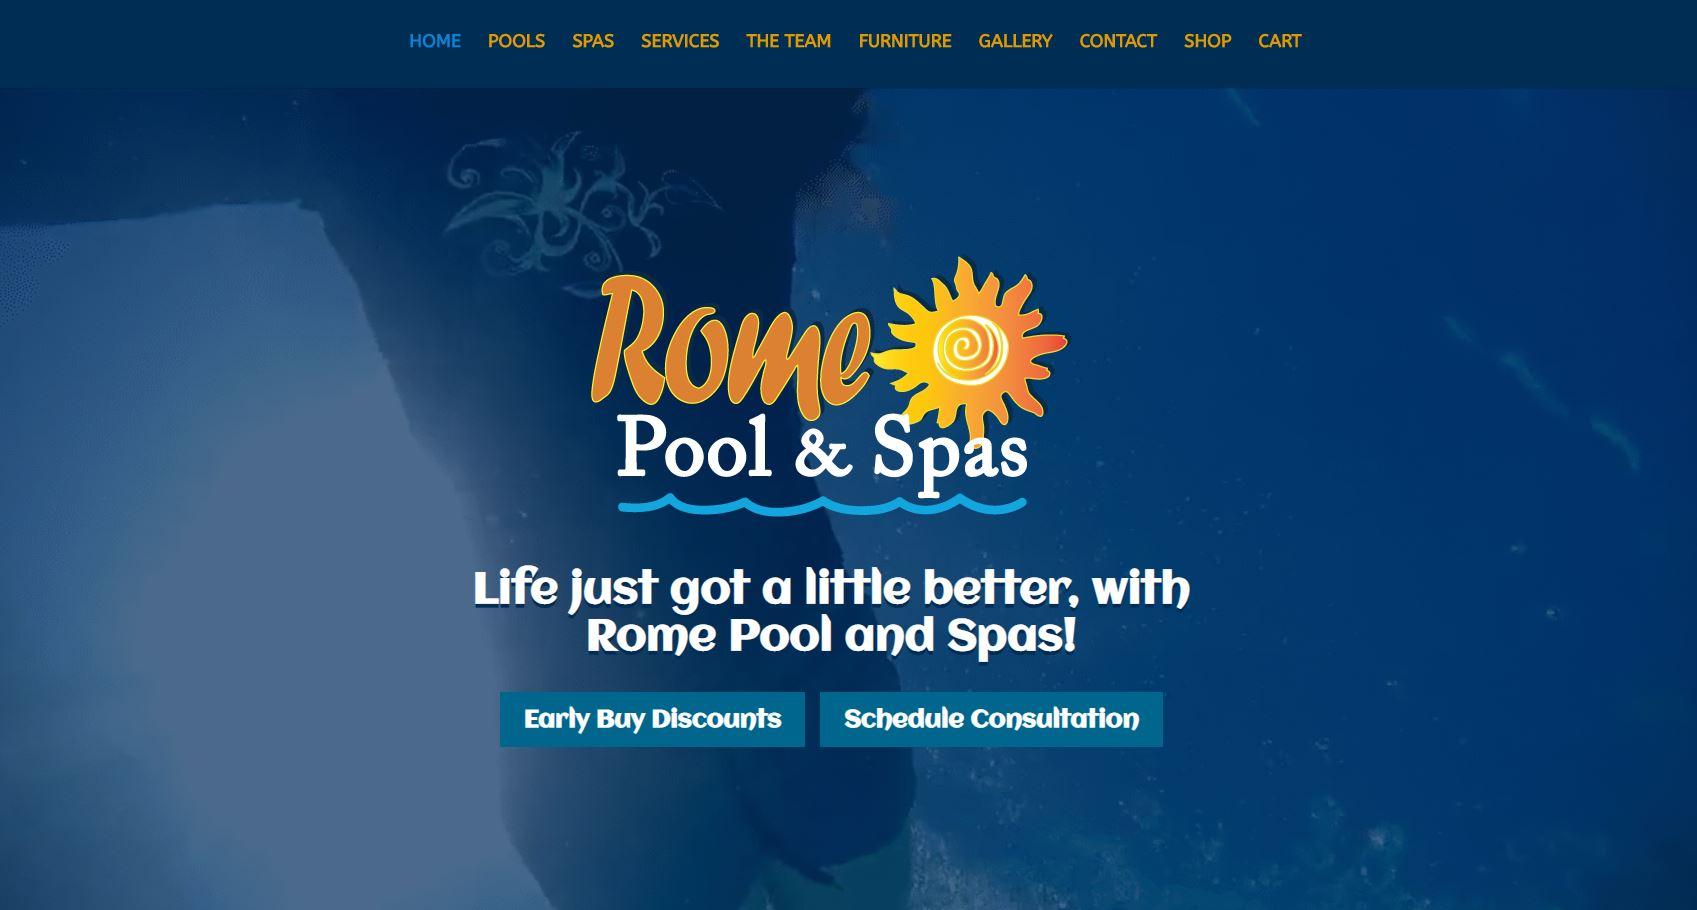 Rome Pool & Spas